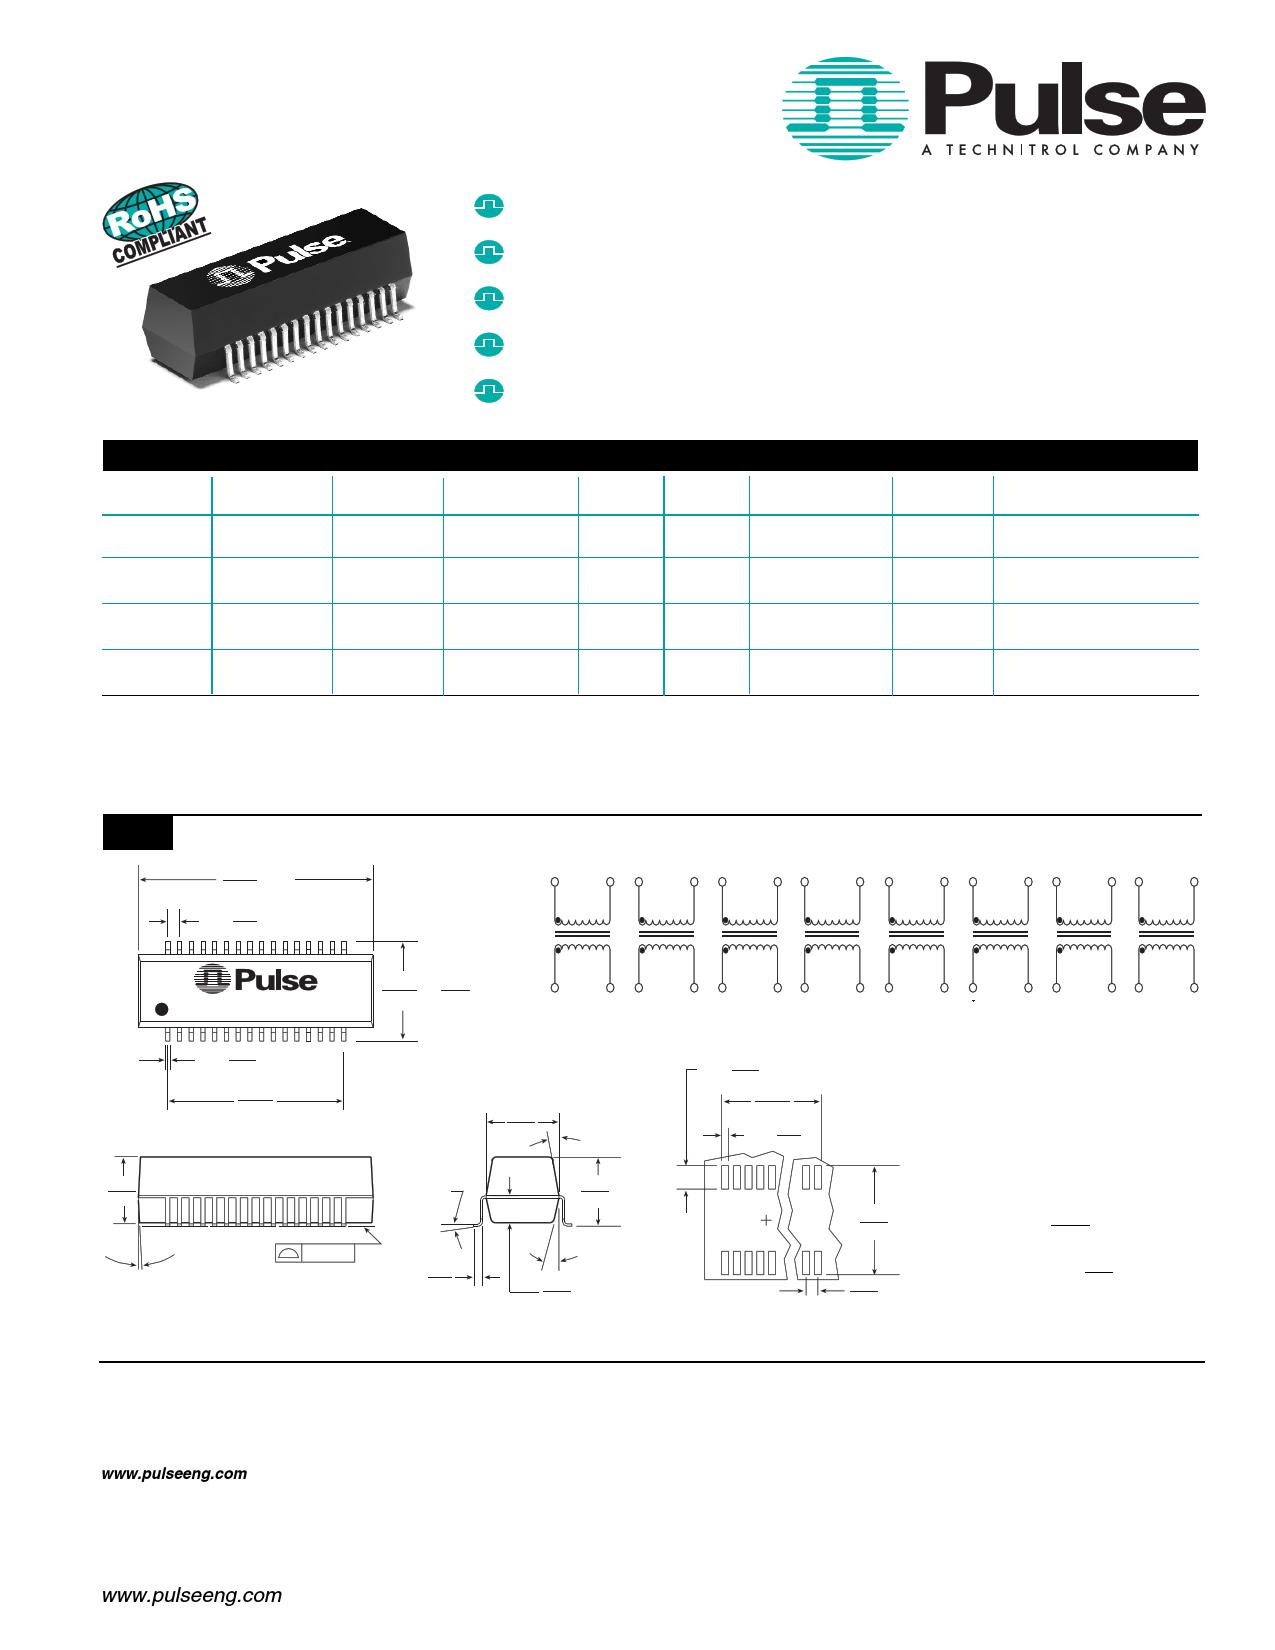 T3048NL 데이터시트 및 T3048NL PDF